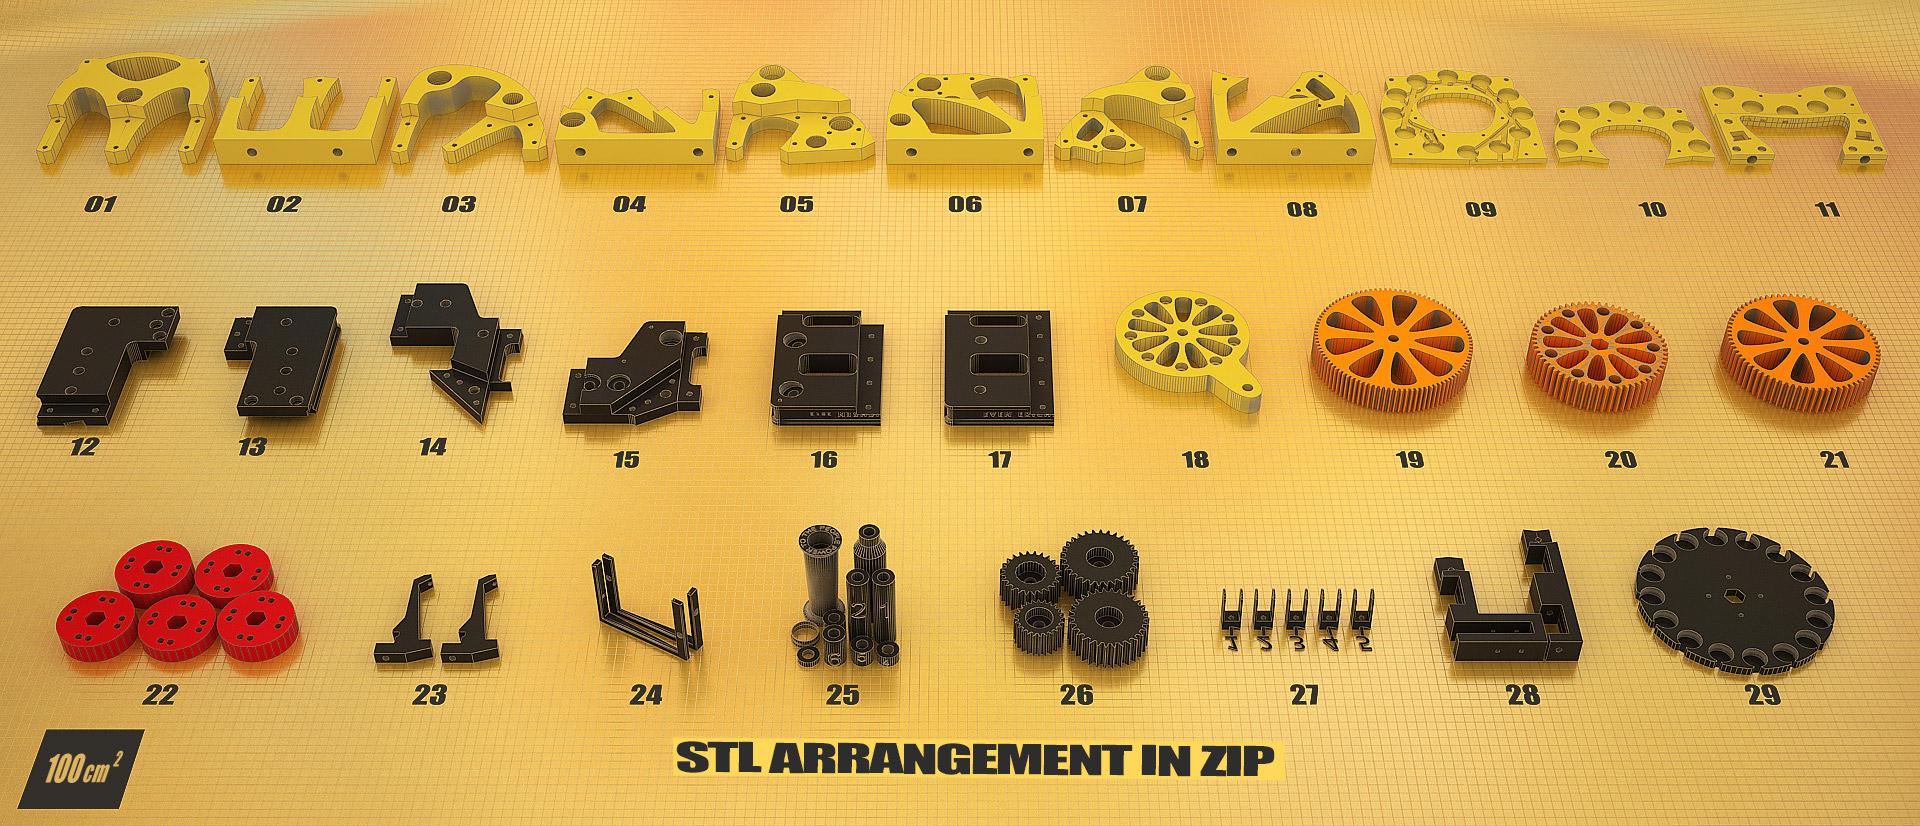 Justpressprint 3d print The Beest STL arrangement in zip